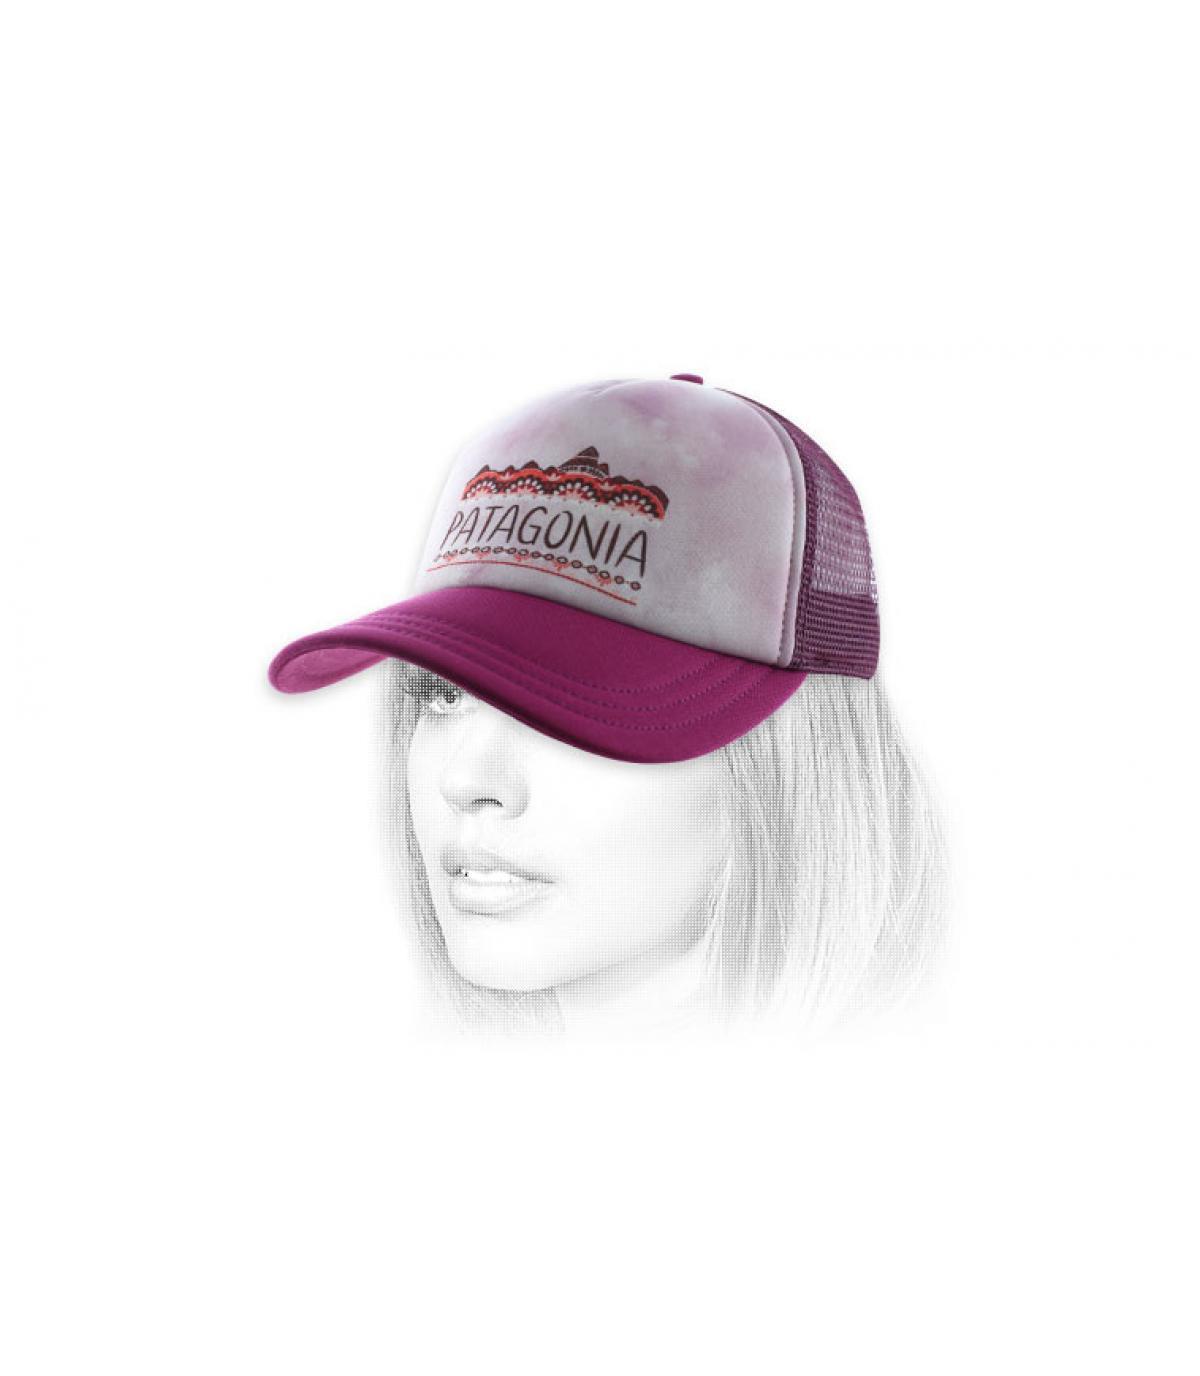 casquette femme violette Patagonia